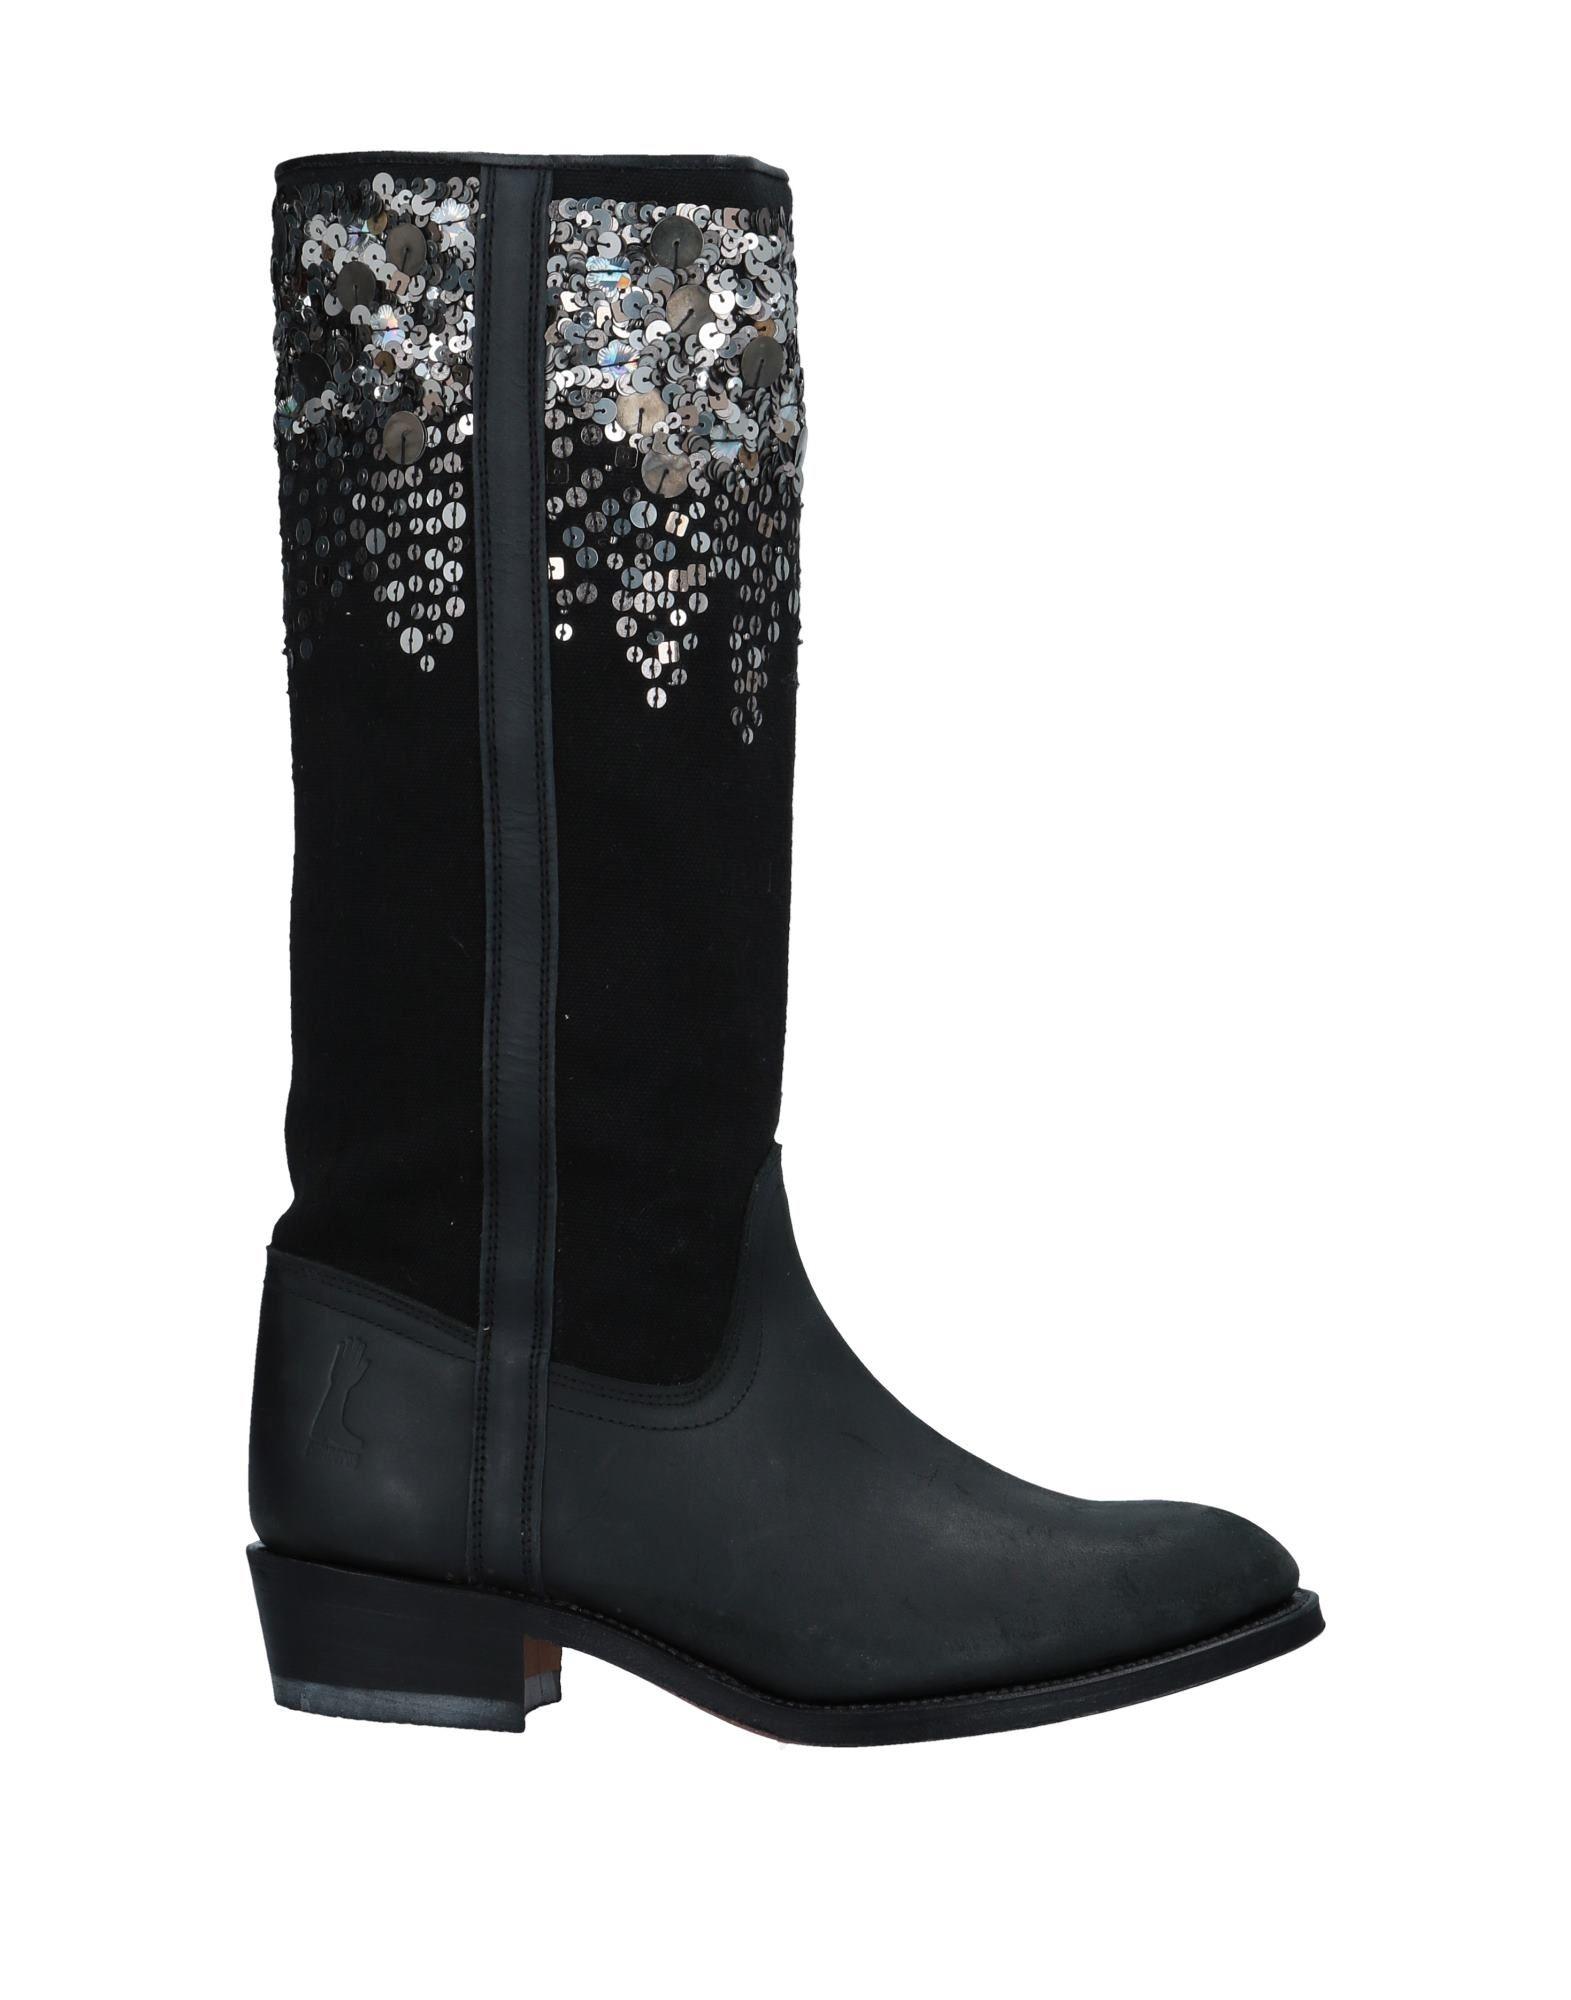 Moda Stivali Stivali Moda Camperos Donna - 11533326WG dd5d18